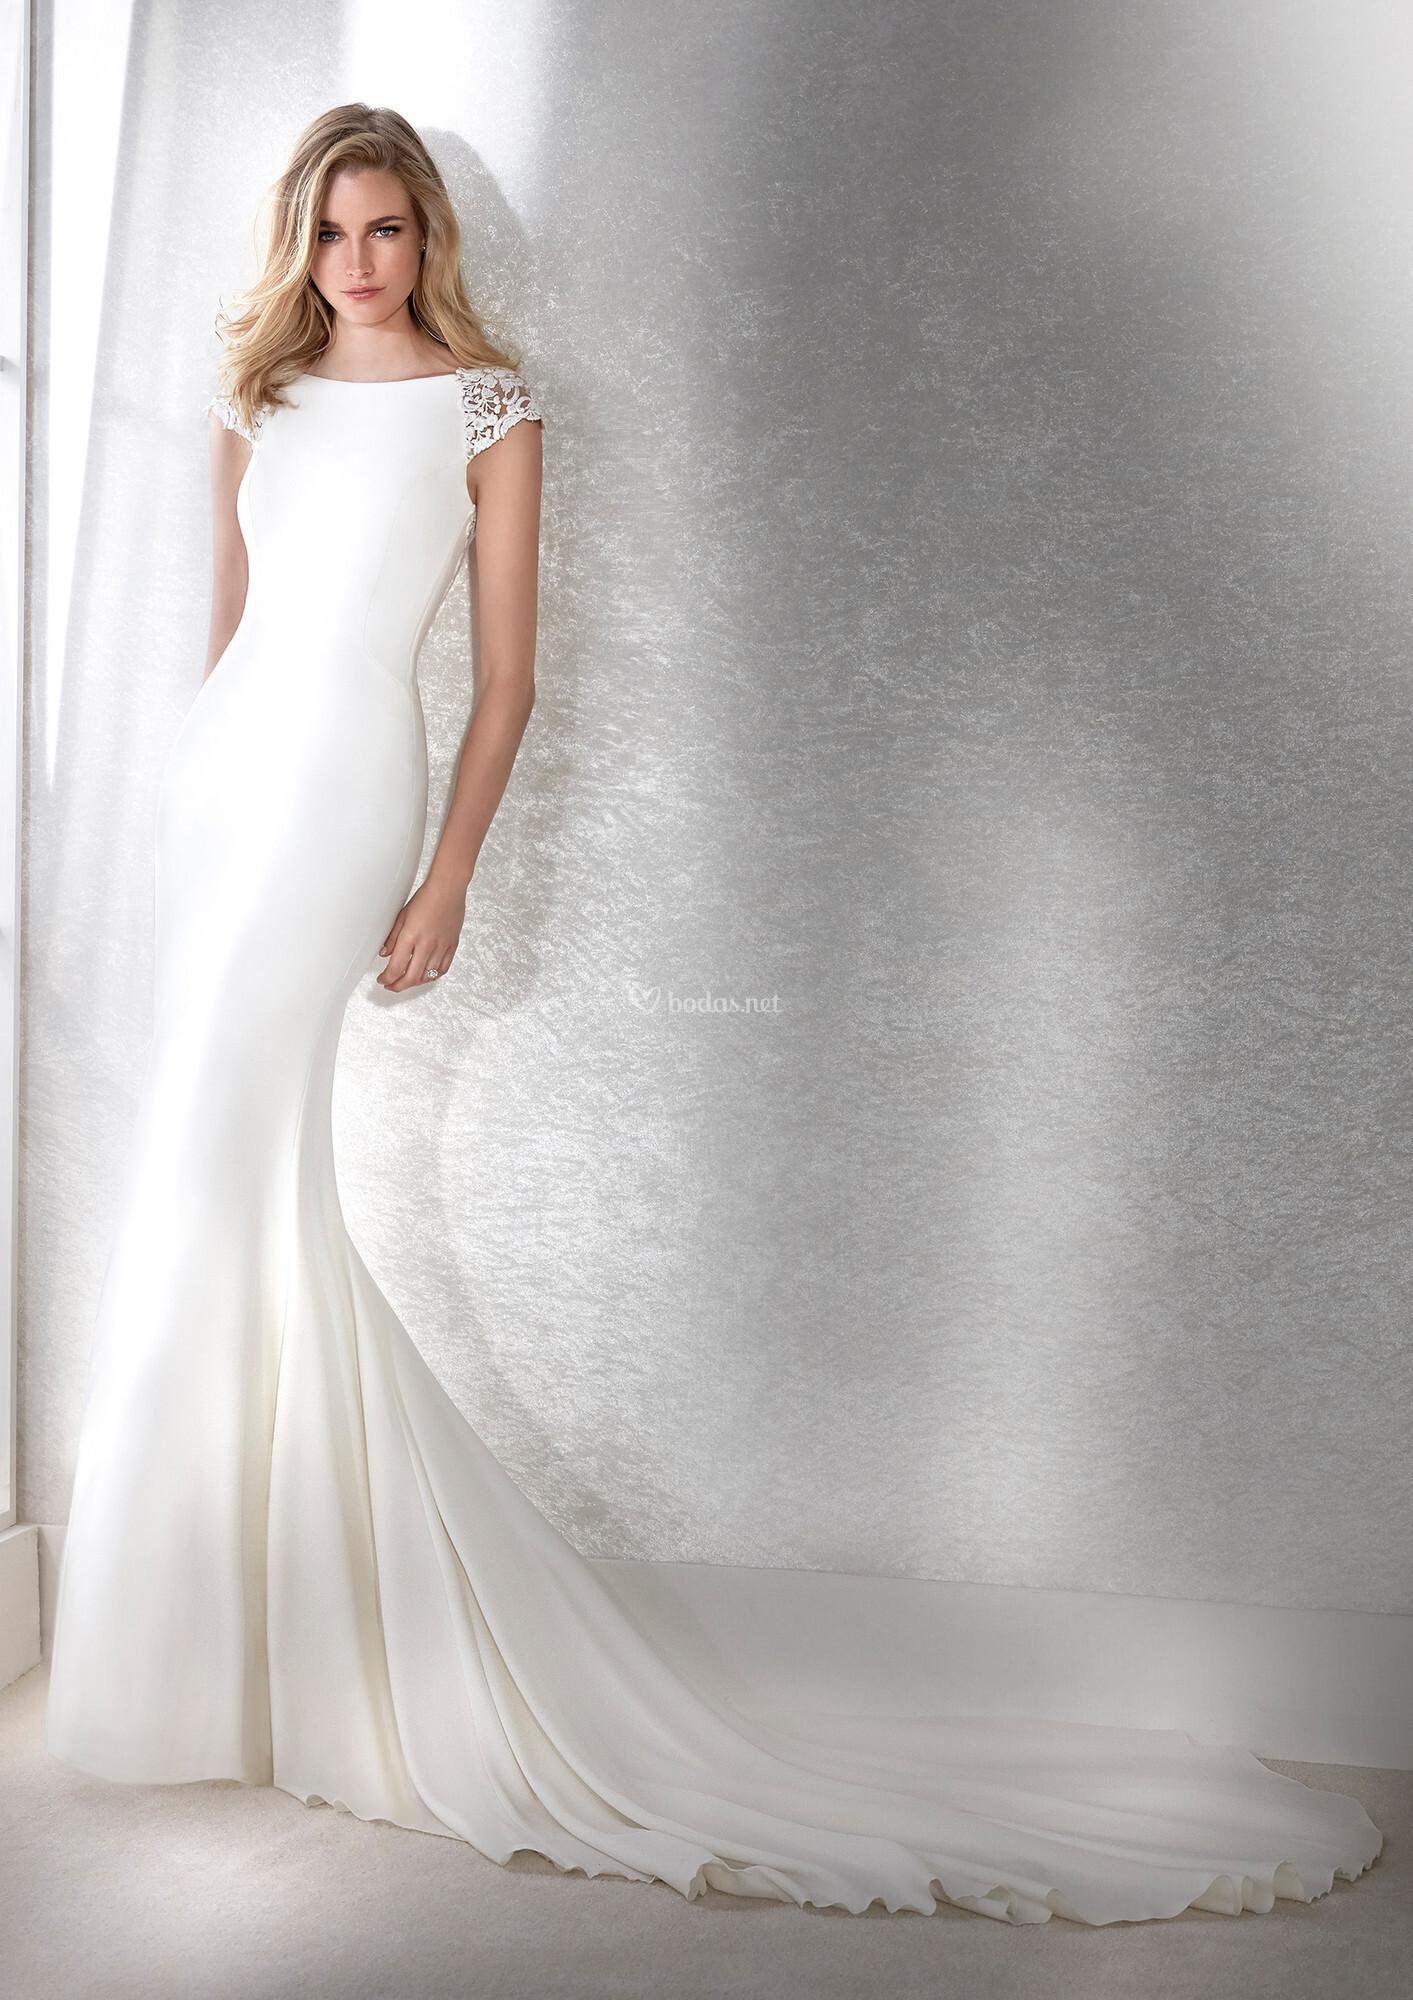 Vestidos corte sirena 2020 8